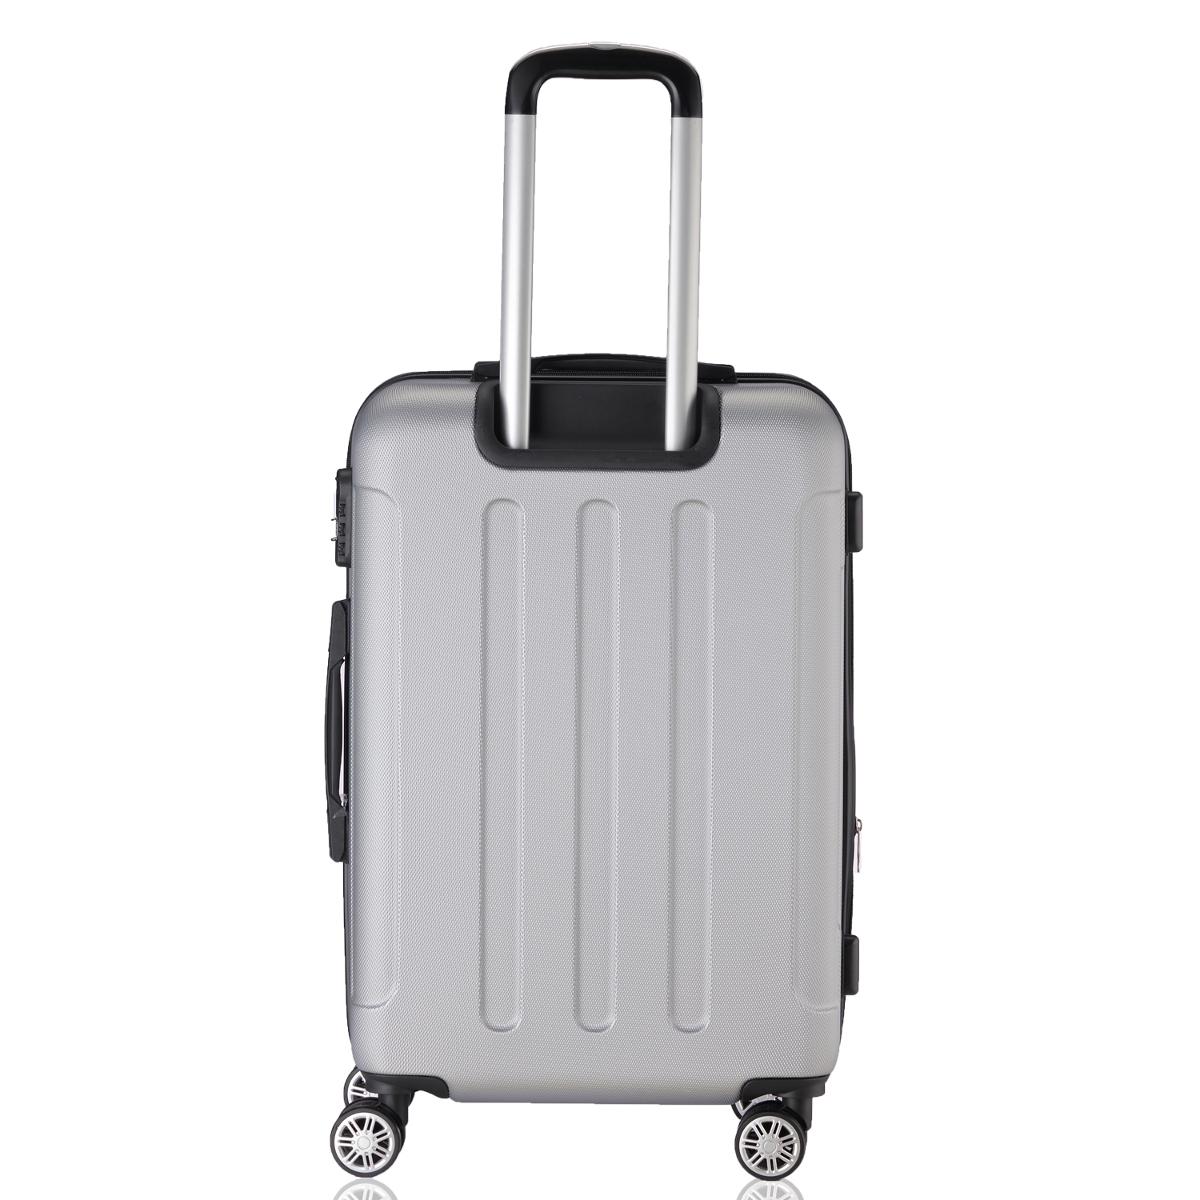 Koffer-Flexot-2045-Hartschalenkoffer-Trolley-Kofferset-Reisekoffer-M-L-XL-Set Indexbild 74